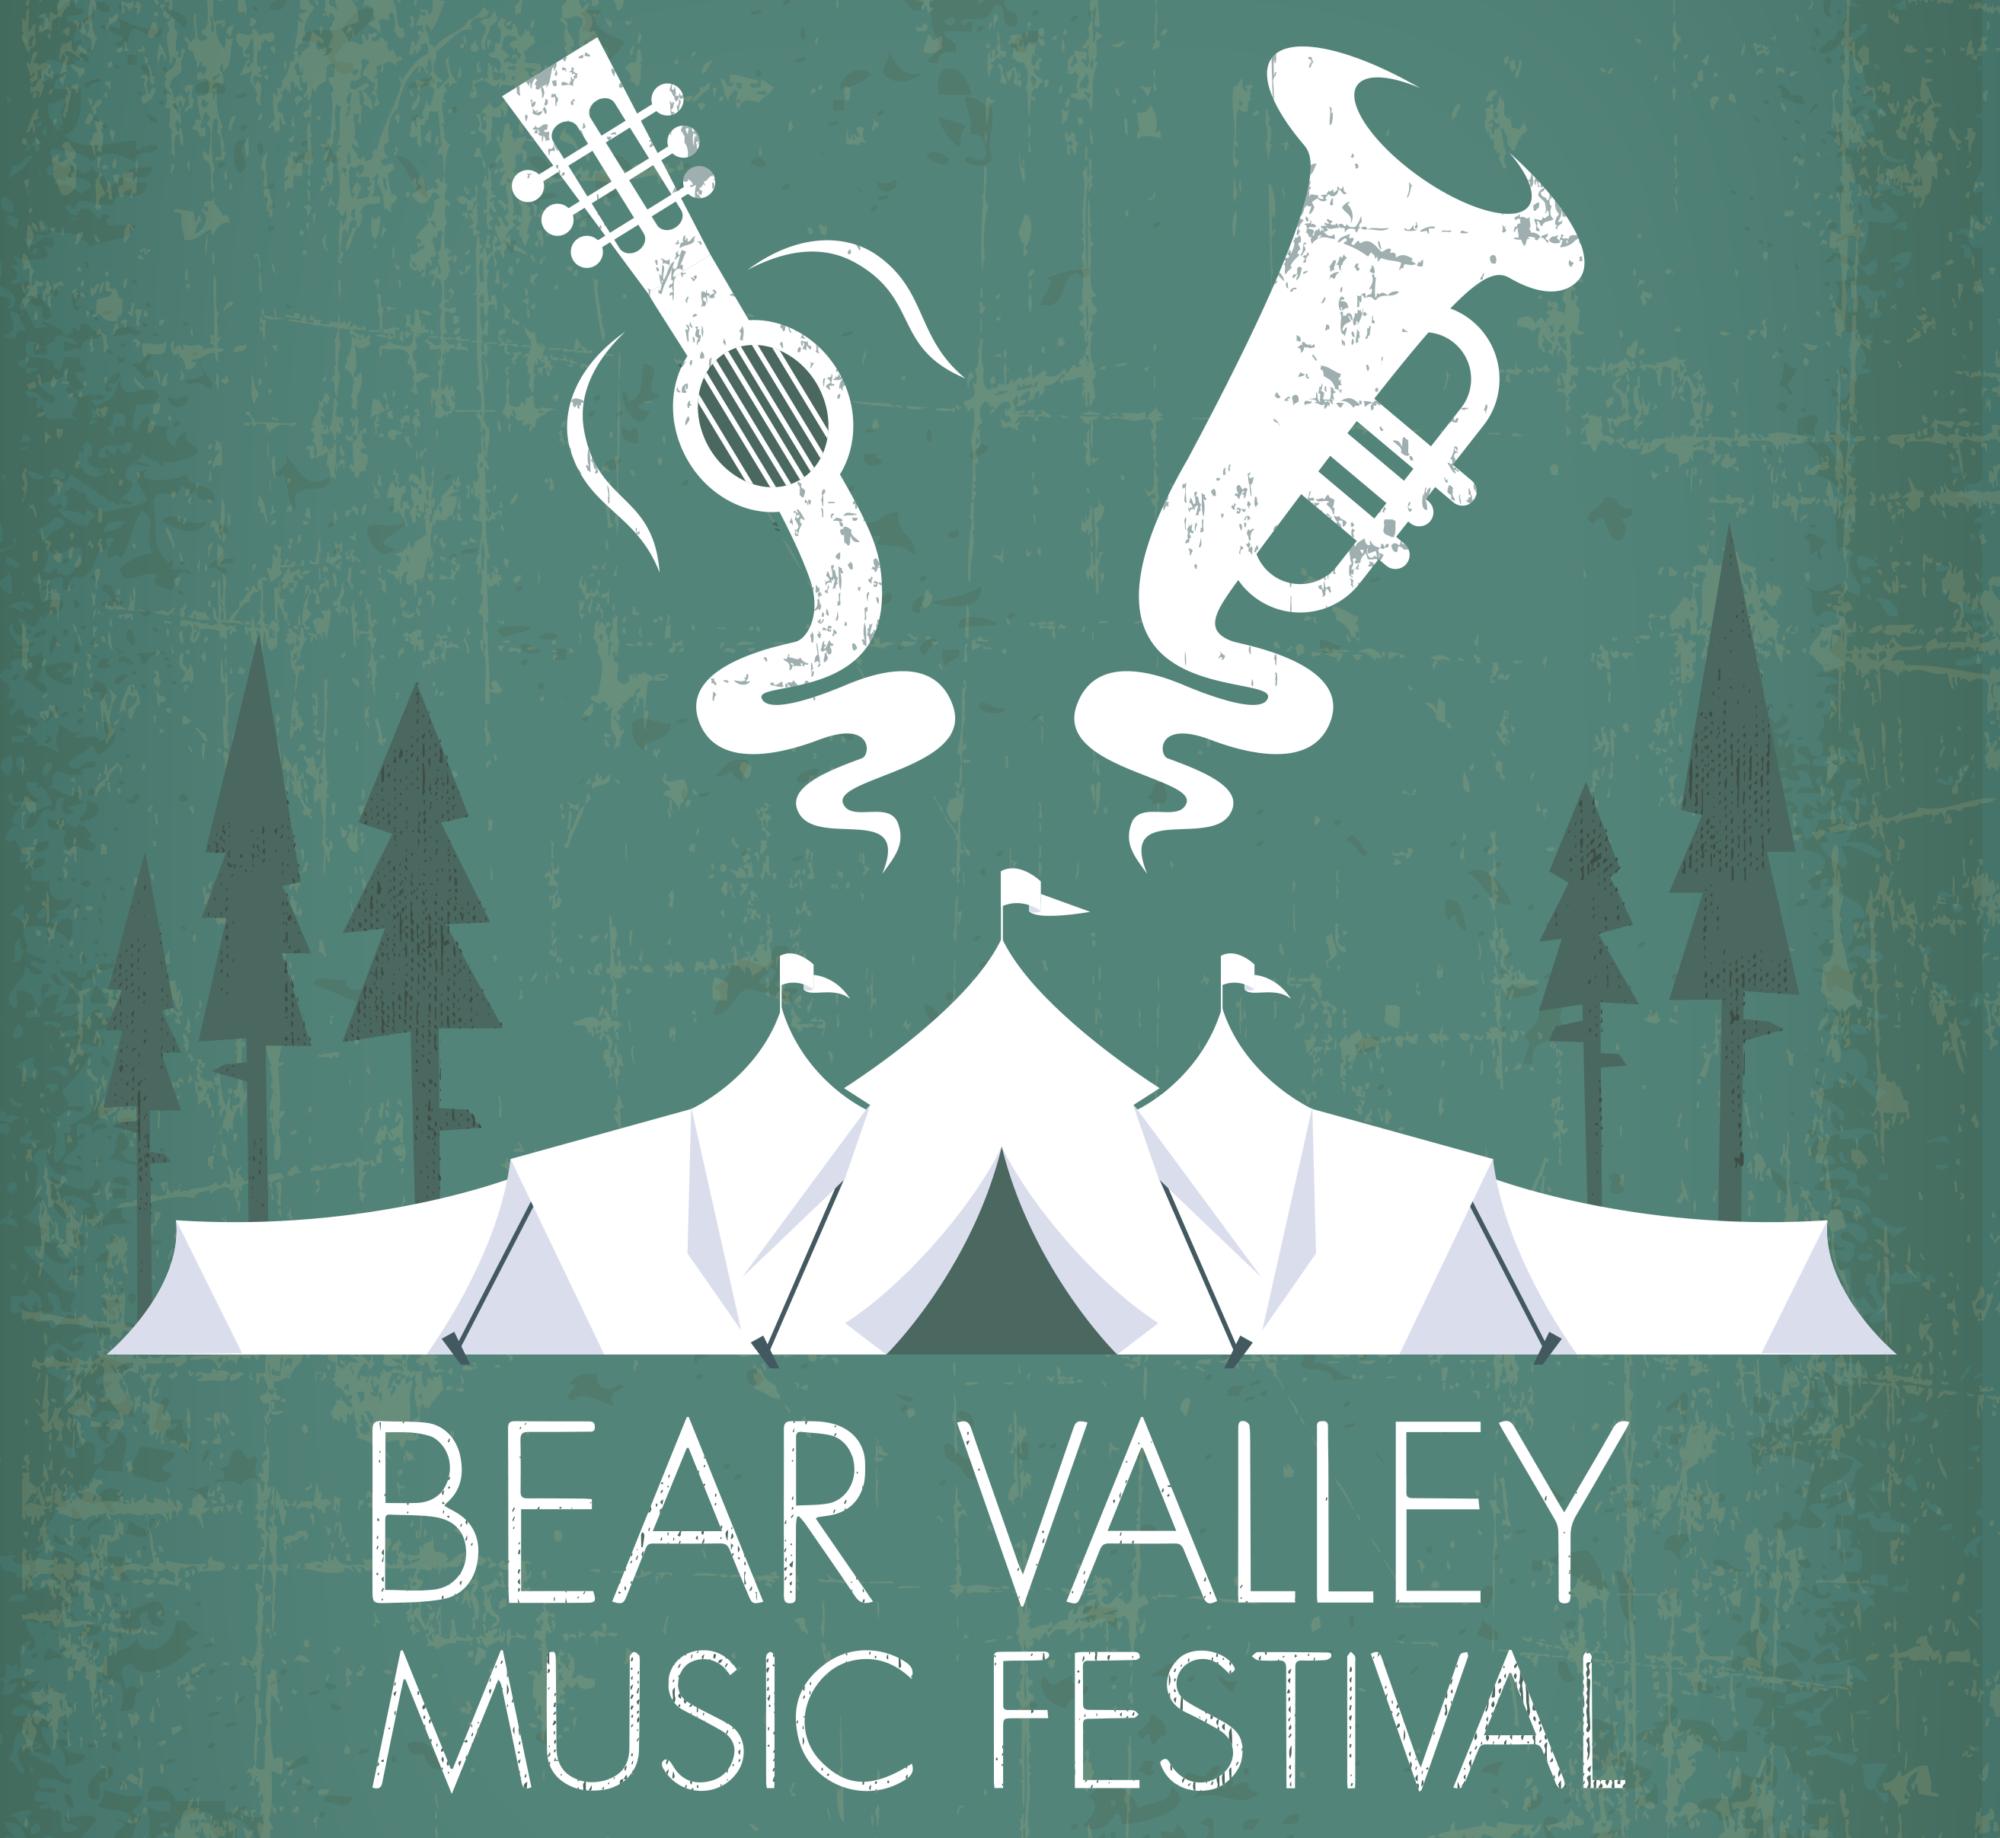 Bear Valley Music Festival